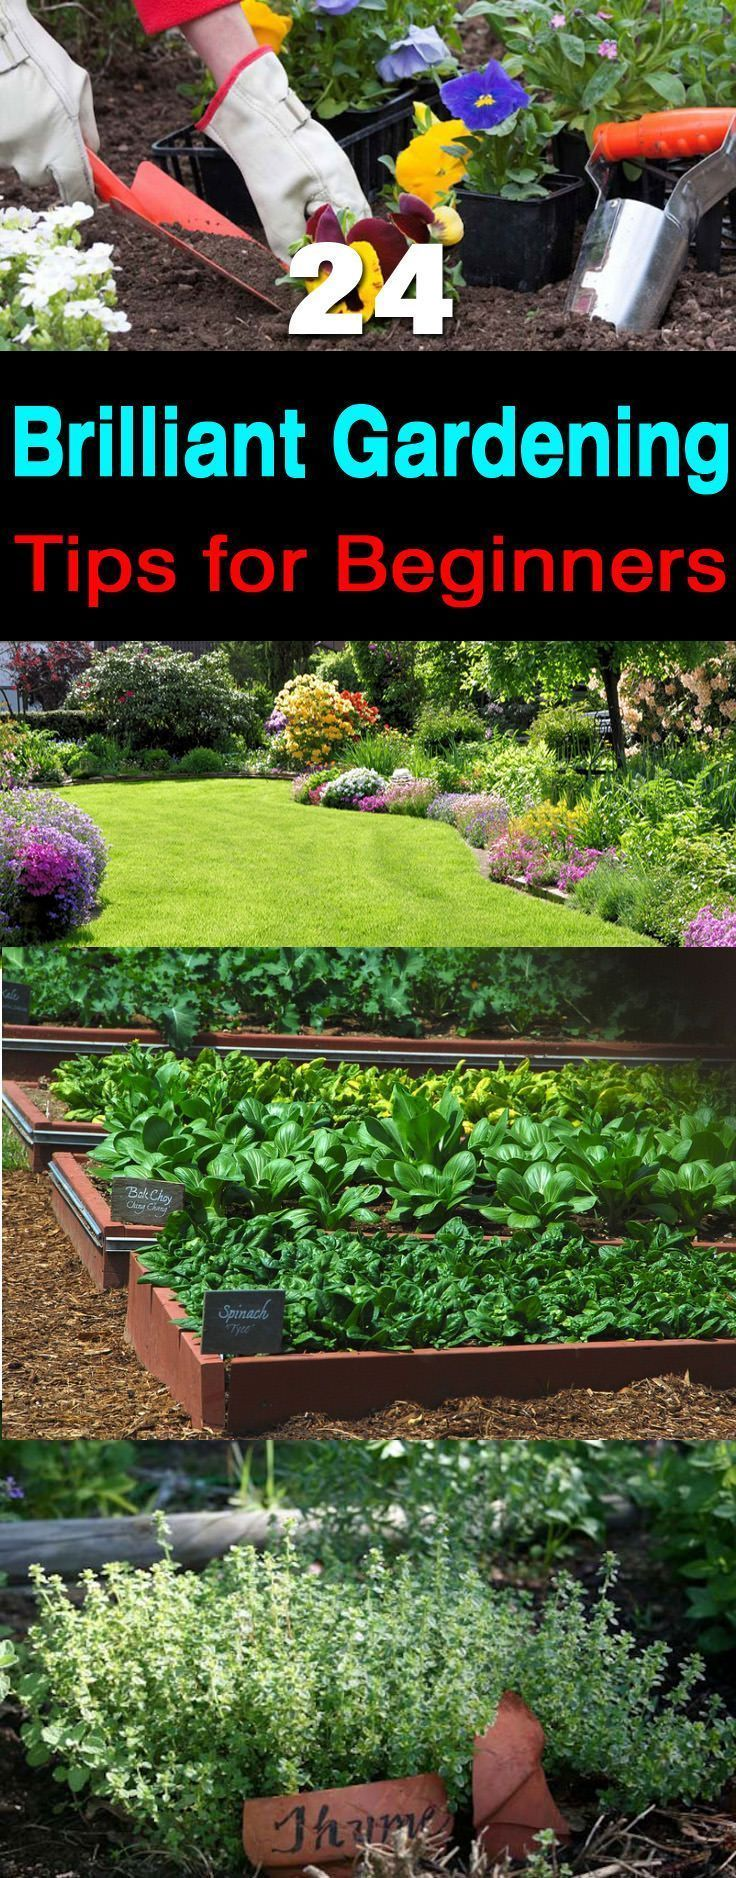 Best 25 gardening ideas on pinterest organic gardening tips gardening tips and vegetable - Vegetable garden ideas for beginners ...